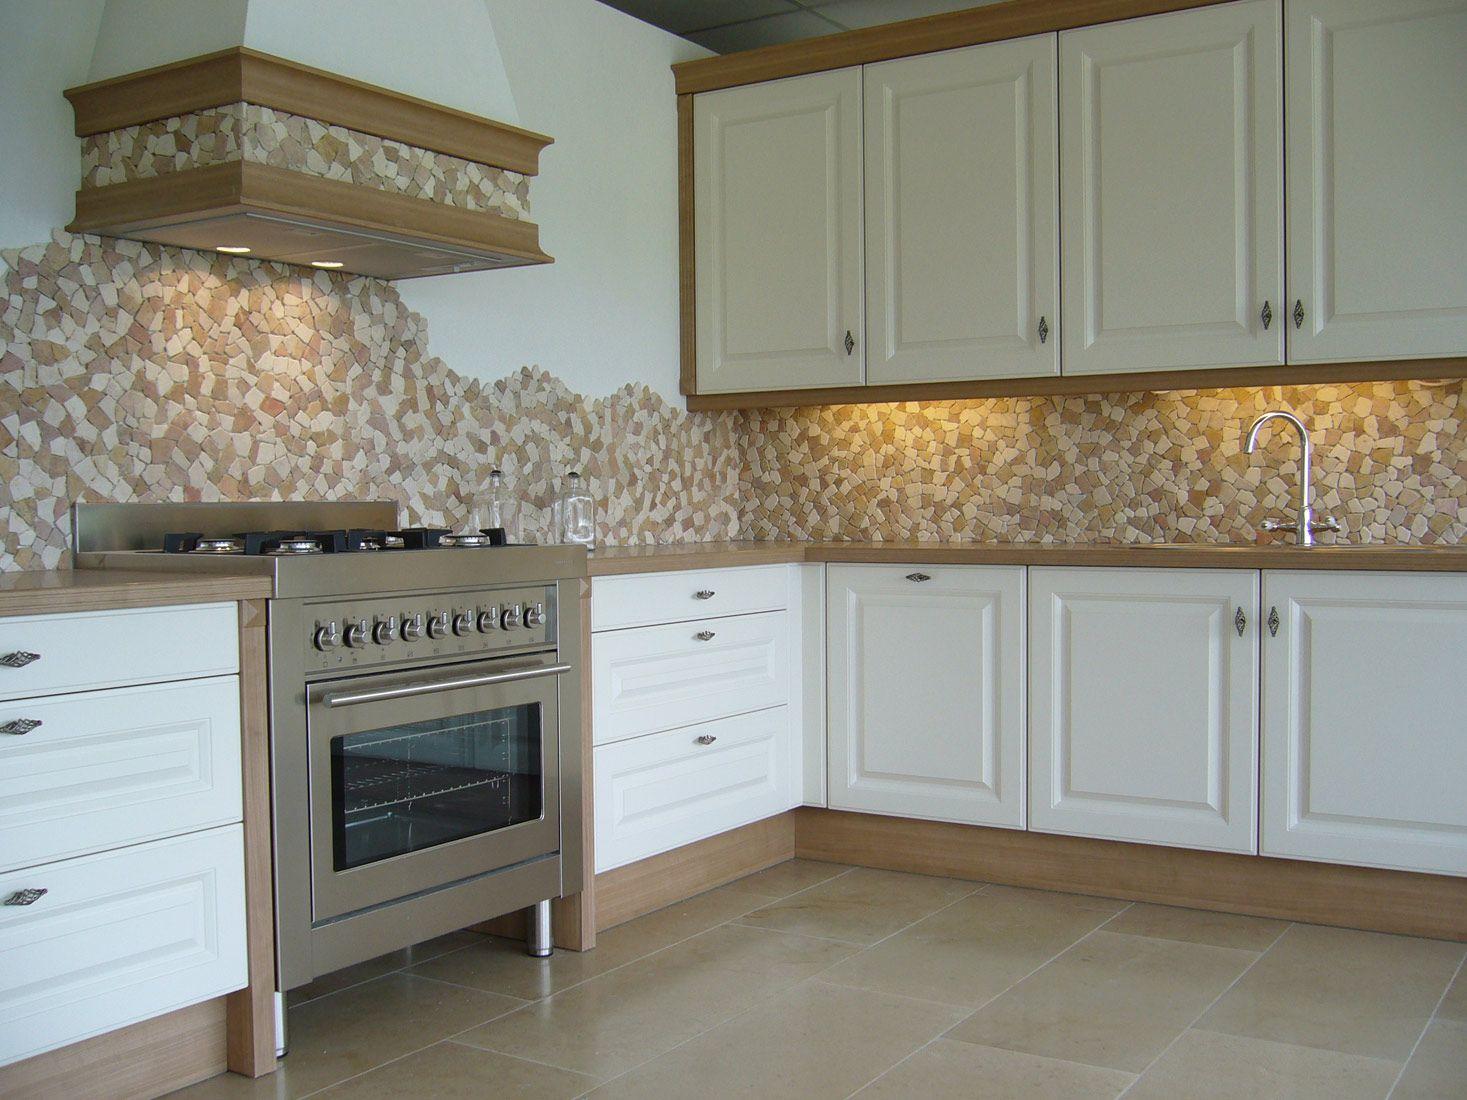 Rivestimento cucina mosaico pietra naturale palladiana su rete in pietra naturale venetian - Mosaico rivestimento cucina ...